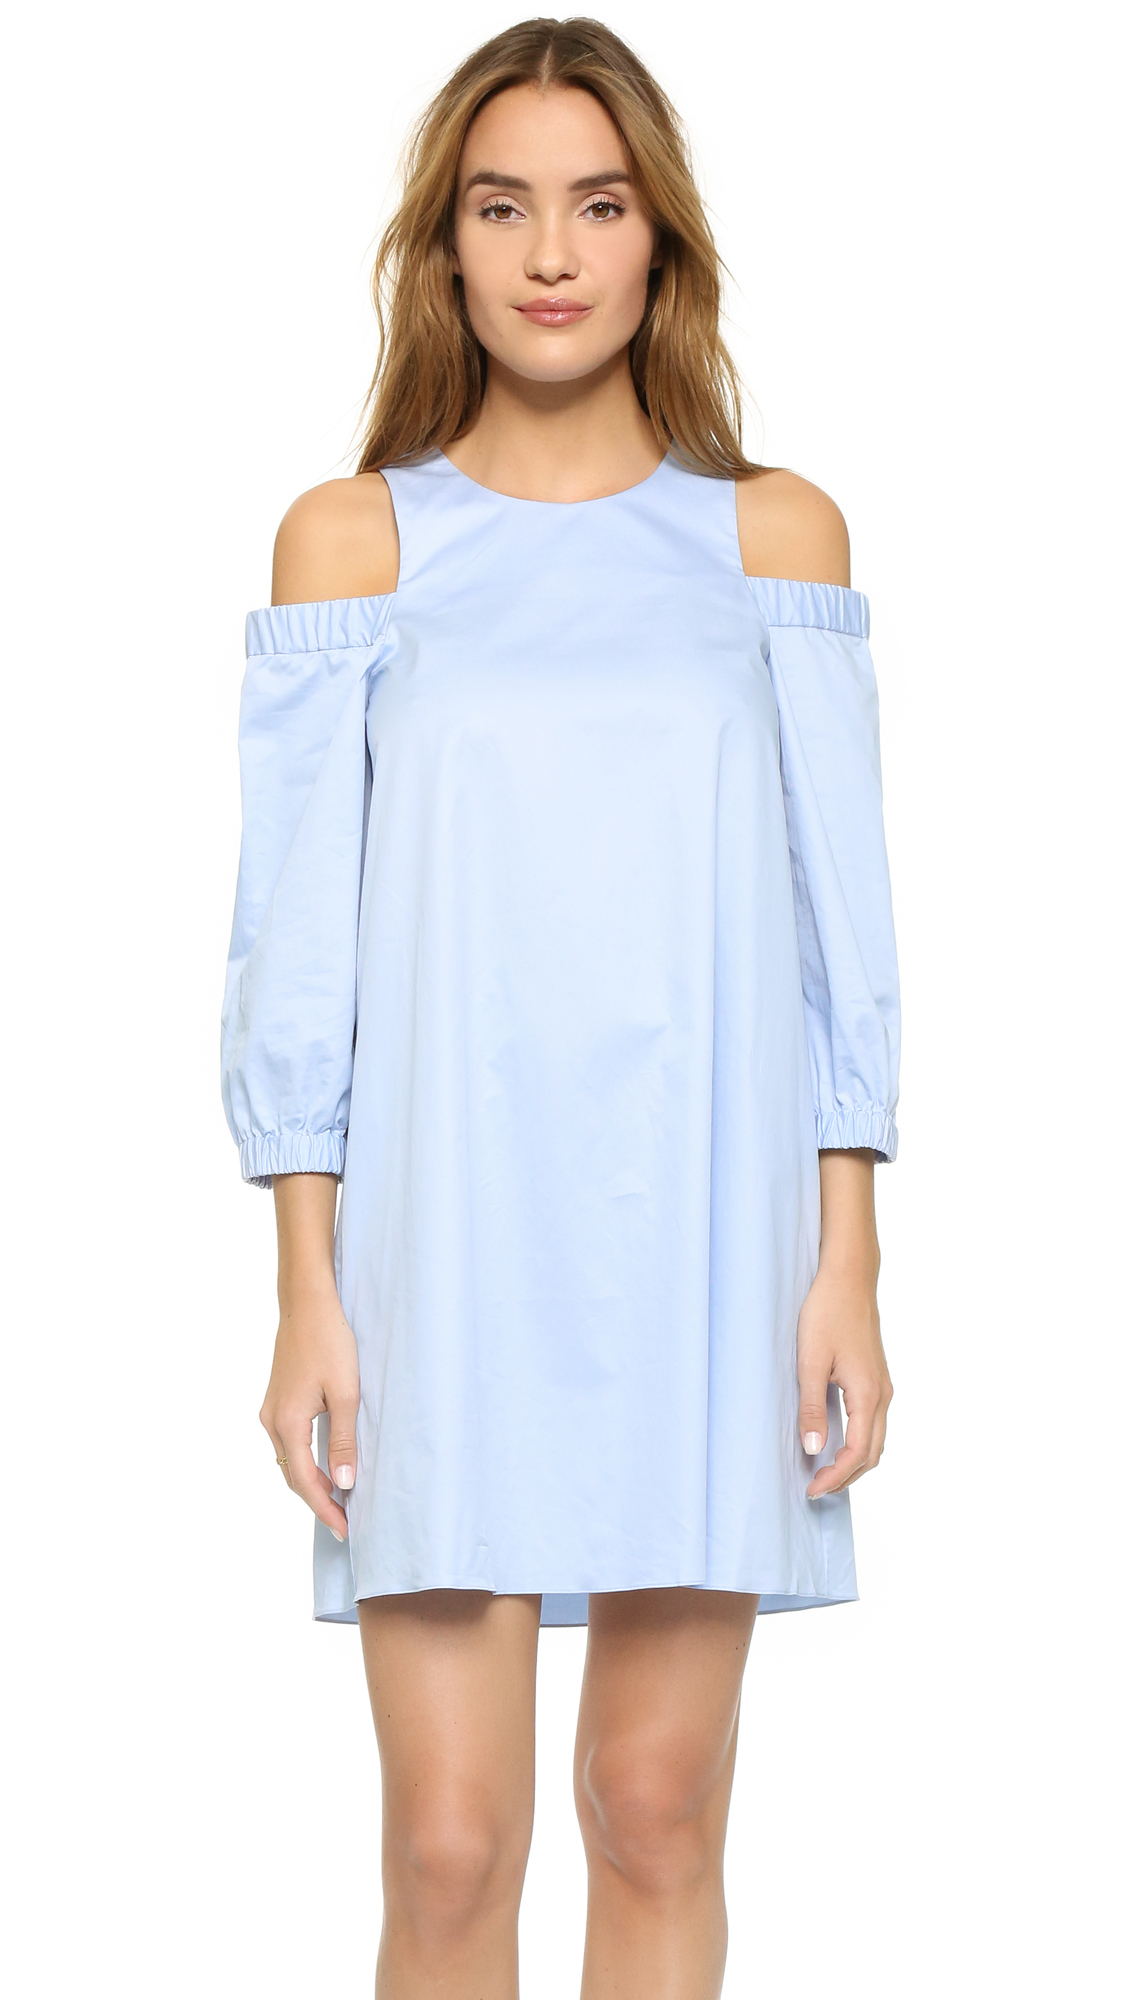 Tibi Cutout Shoulder Dress in Blue - Lyst